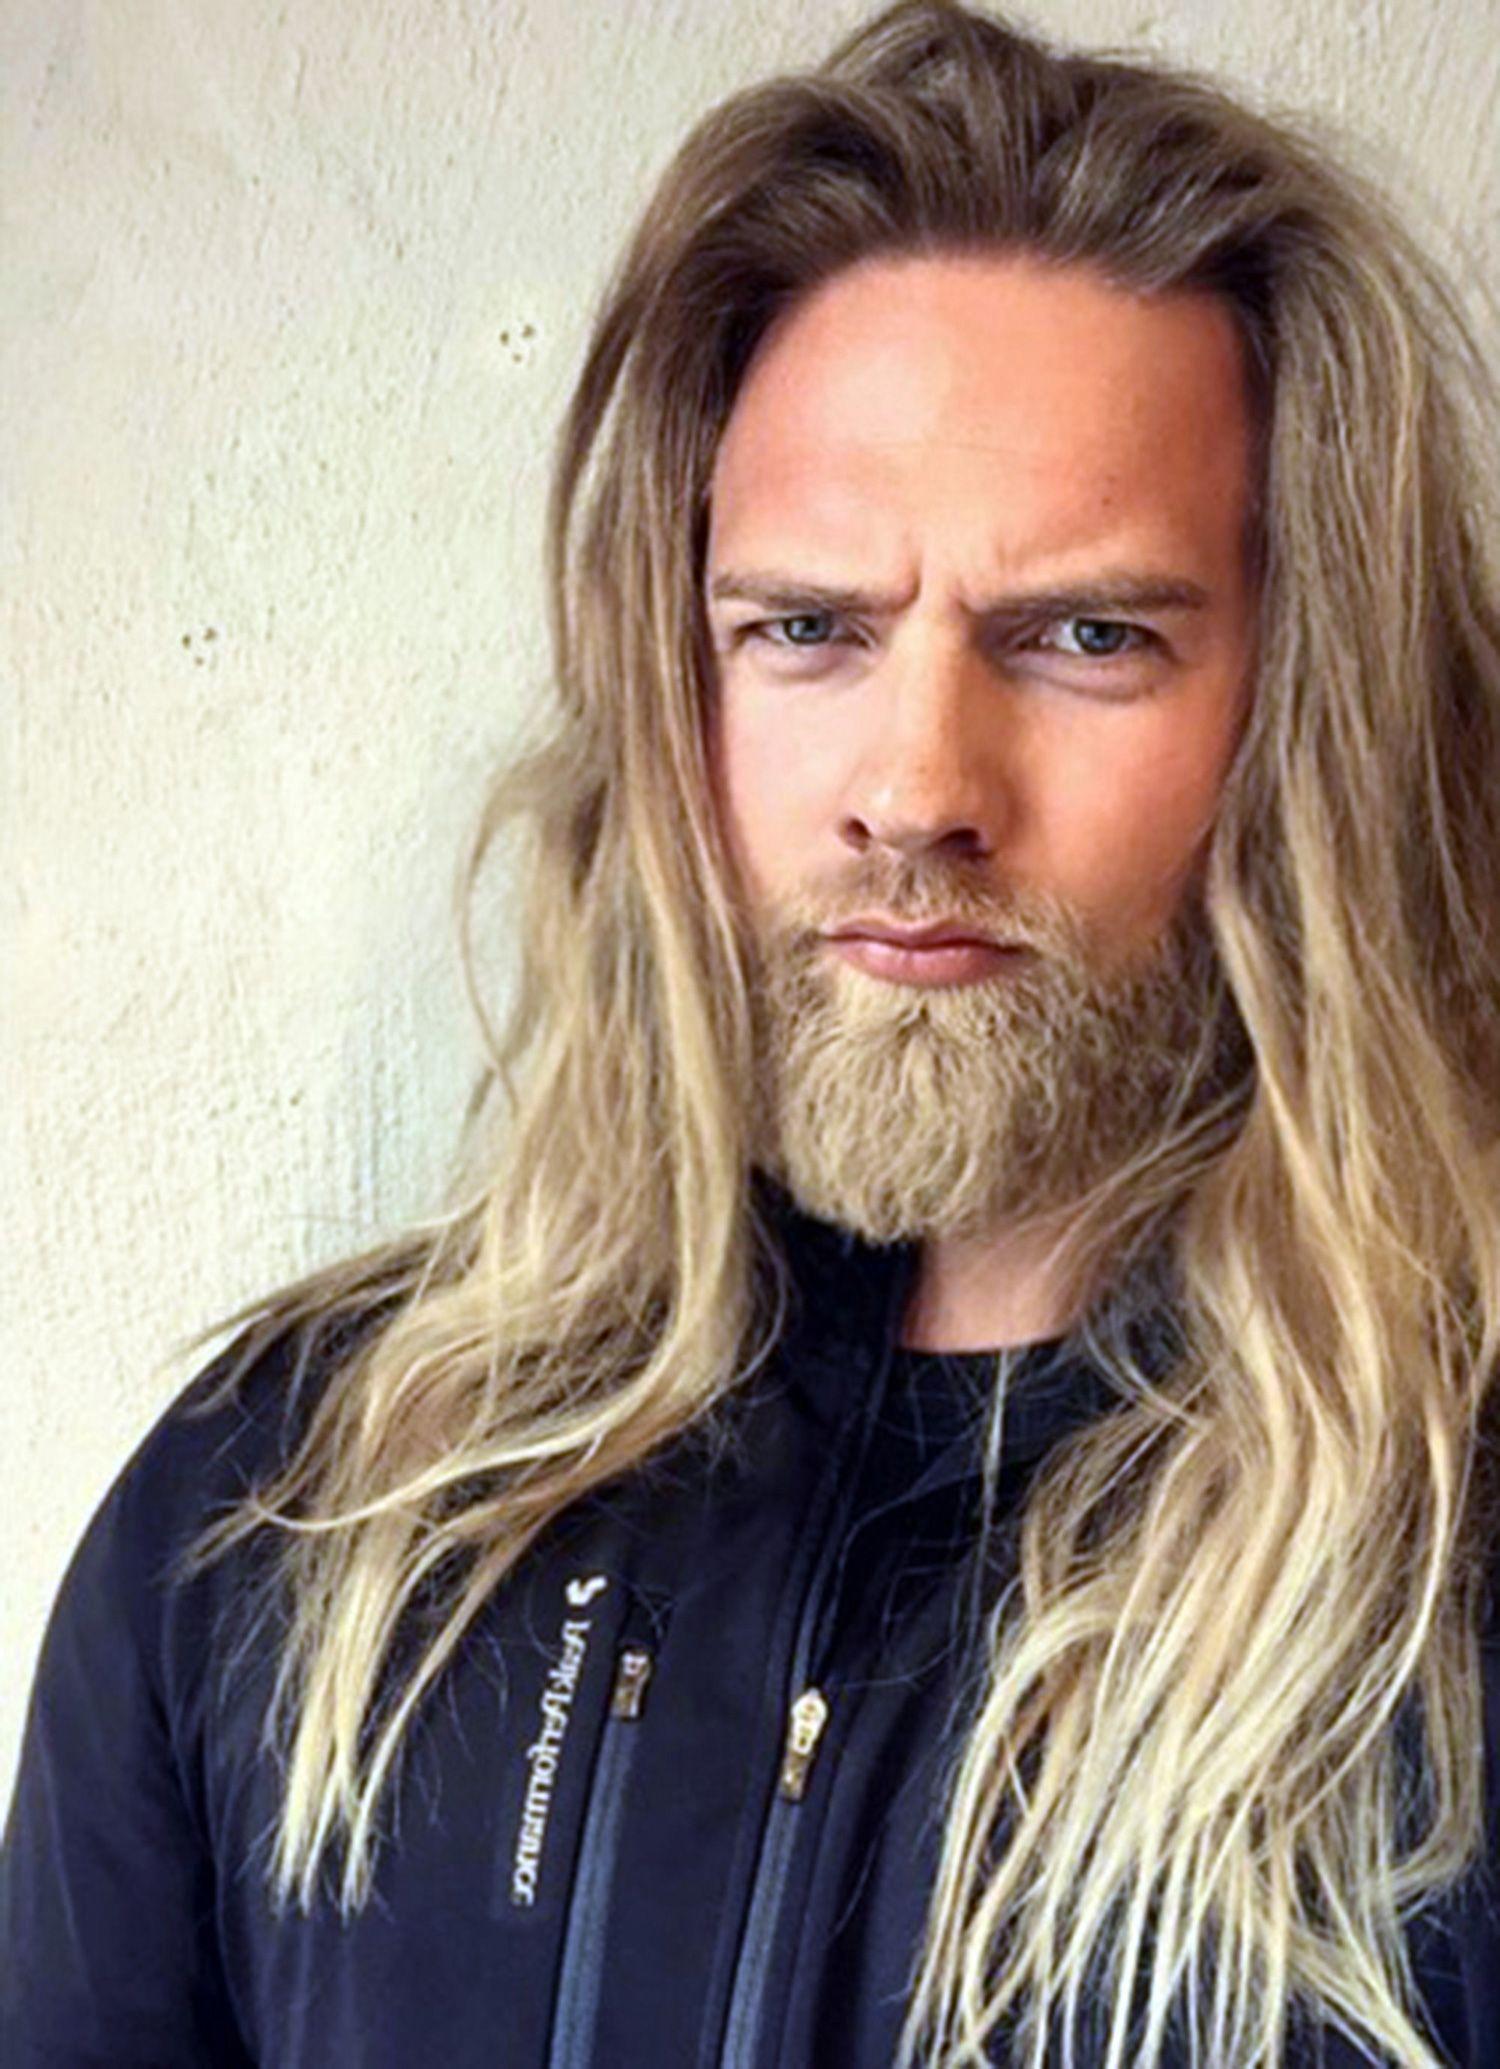 Norwegian Navy officer has Instagram lusting thanks to his Viking